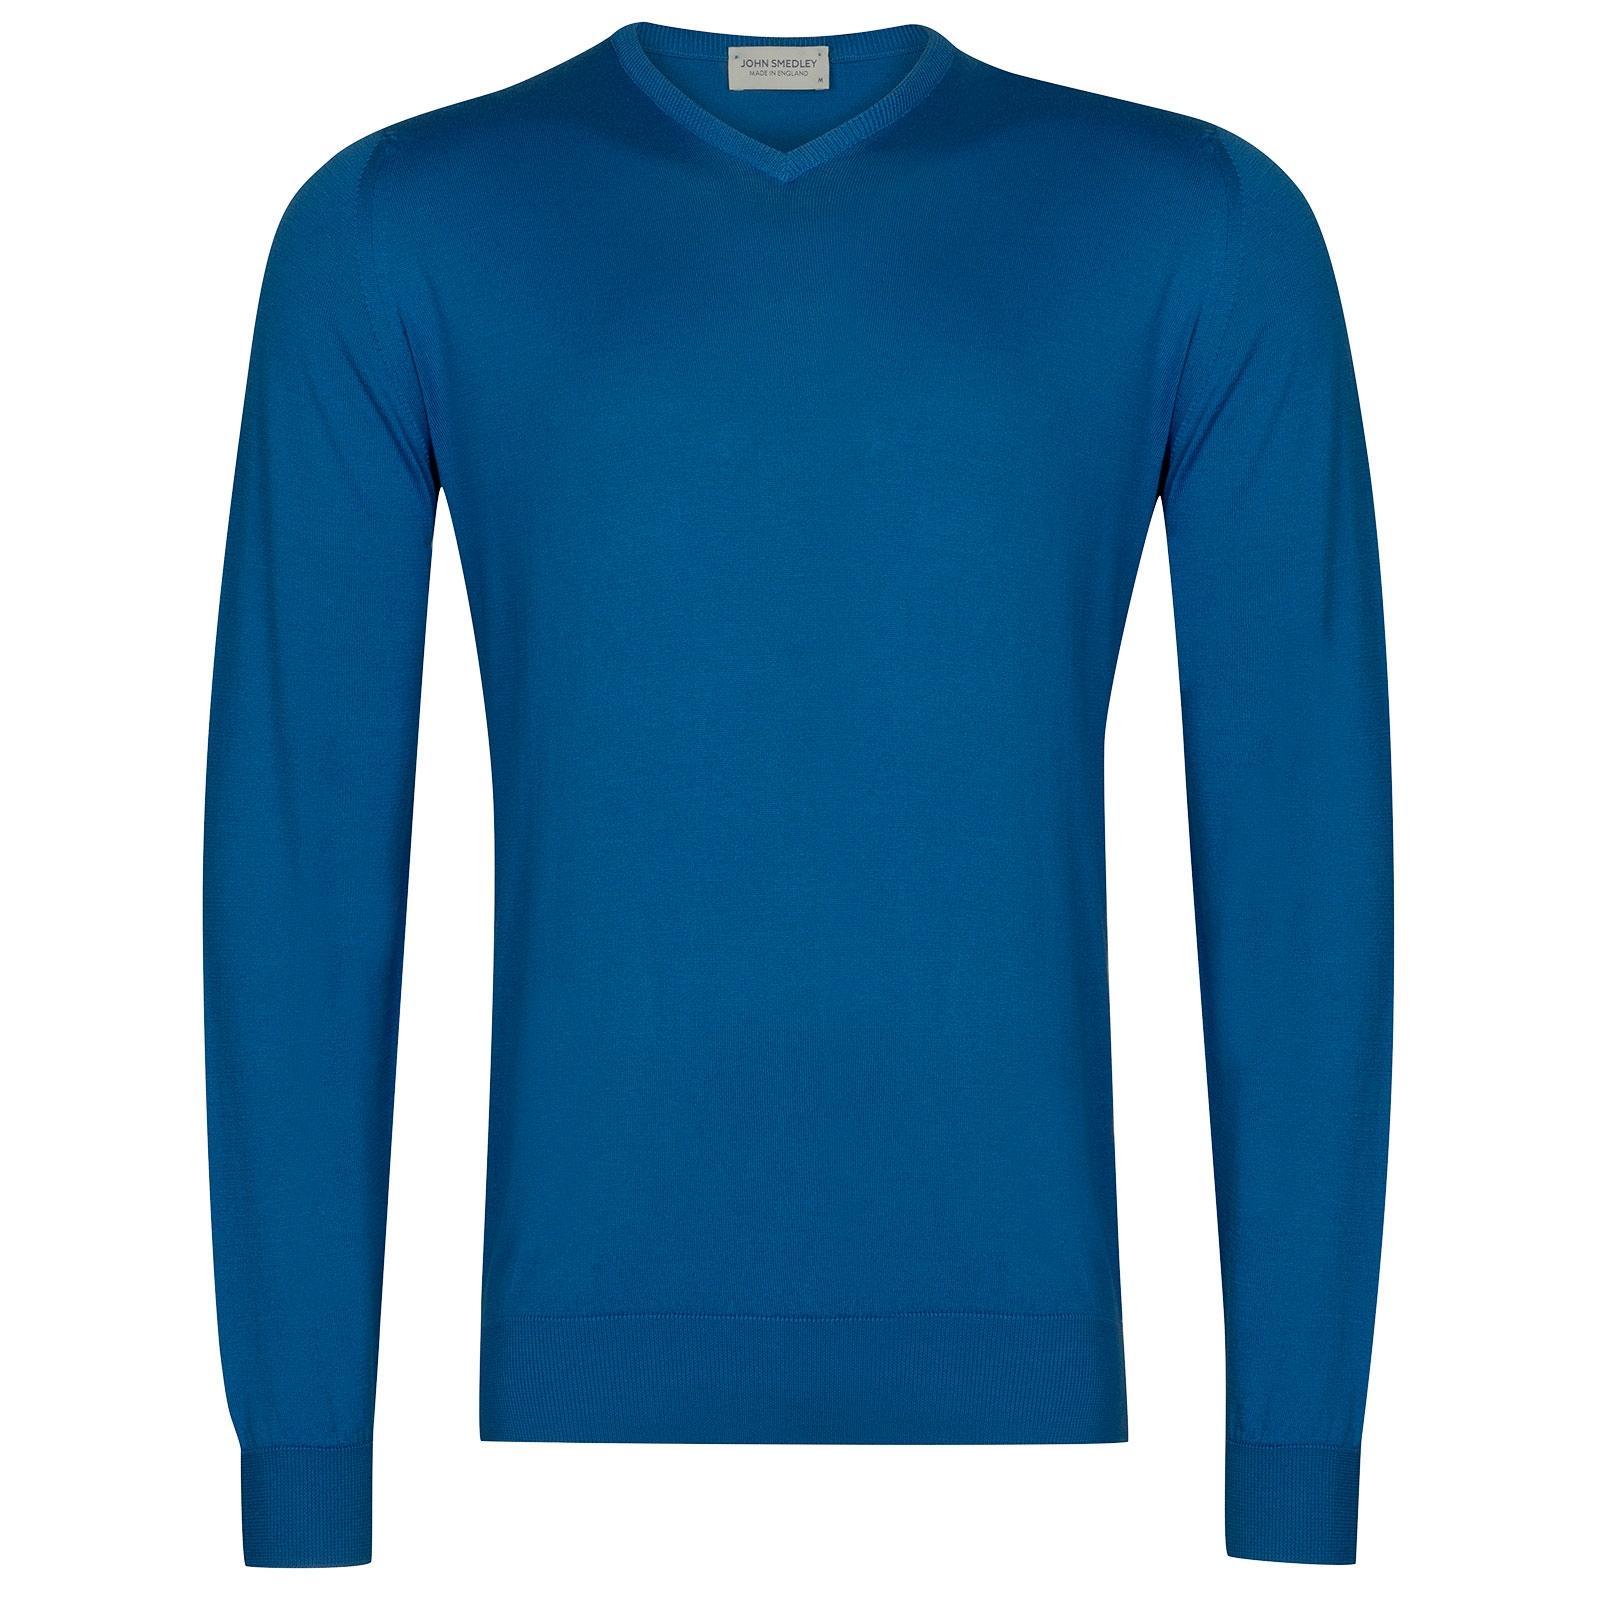 John Smedley Aydon in Statice Blue Pullover-LGE